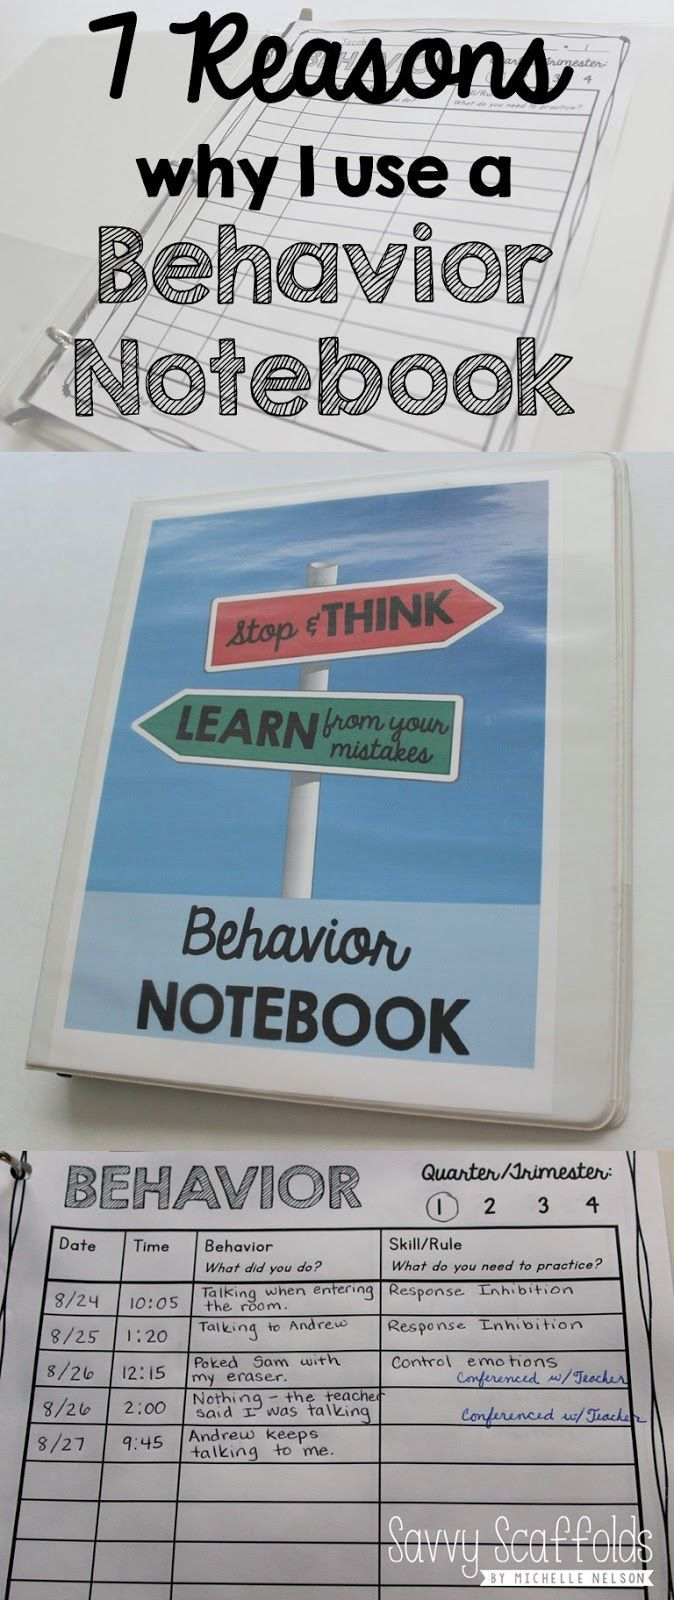 Classroom Notebook Ideas : Reasons why i use a behavior notebook for classroom